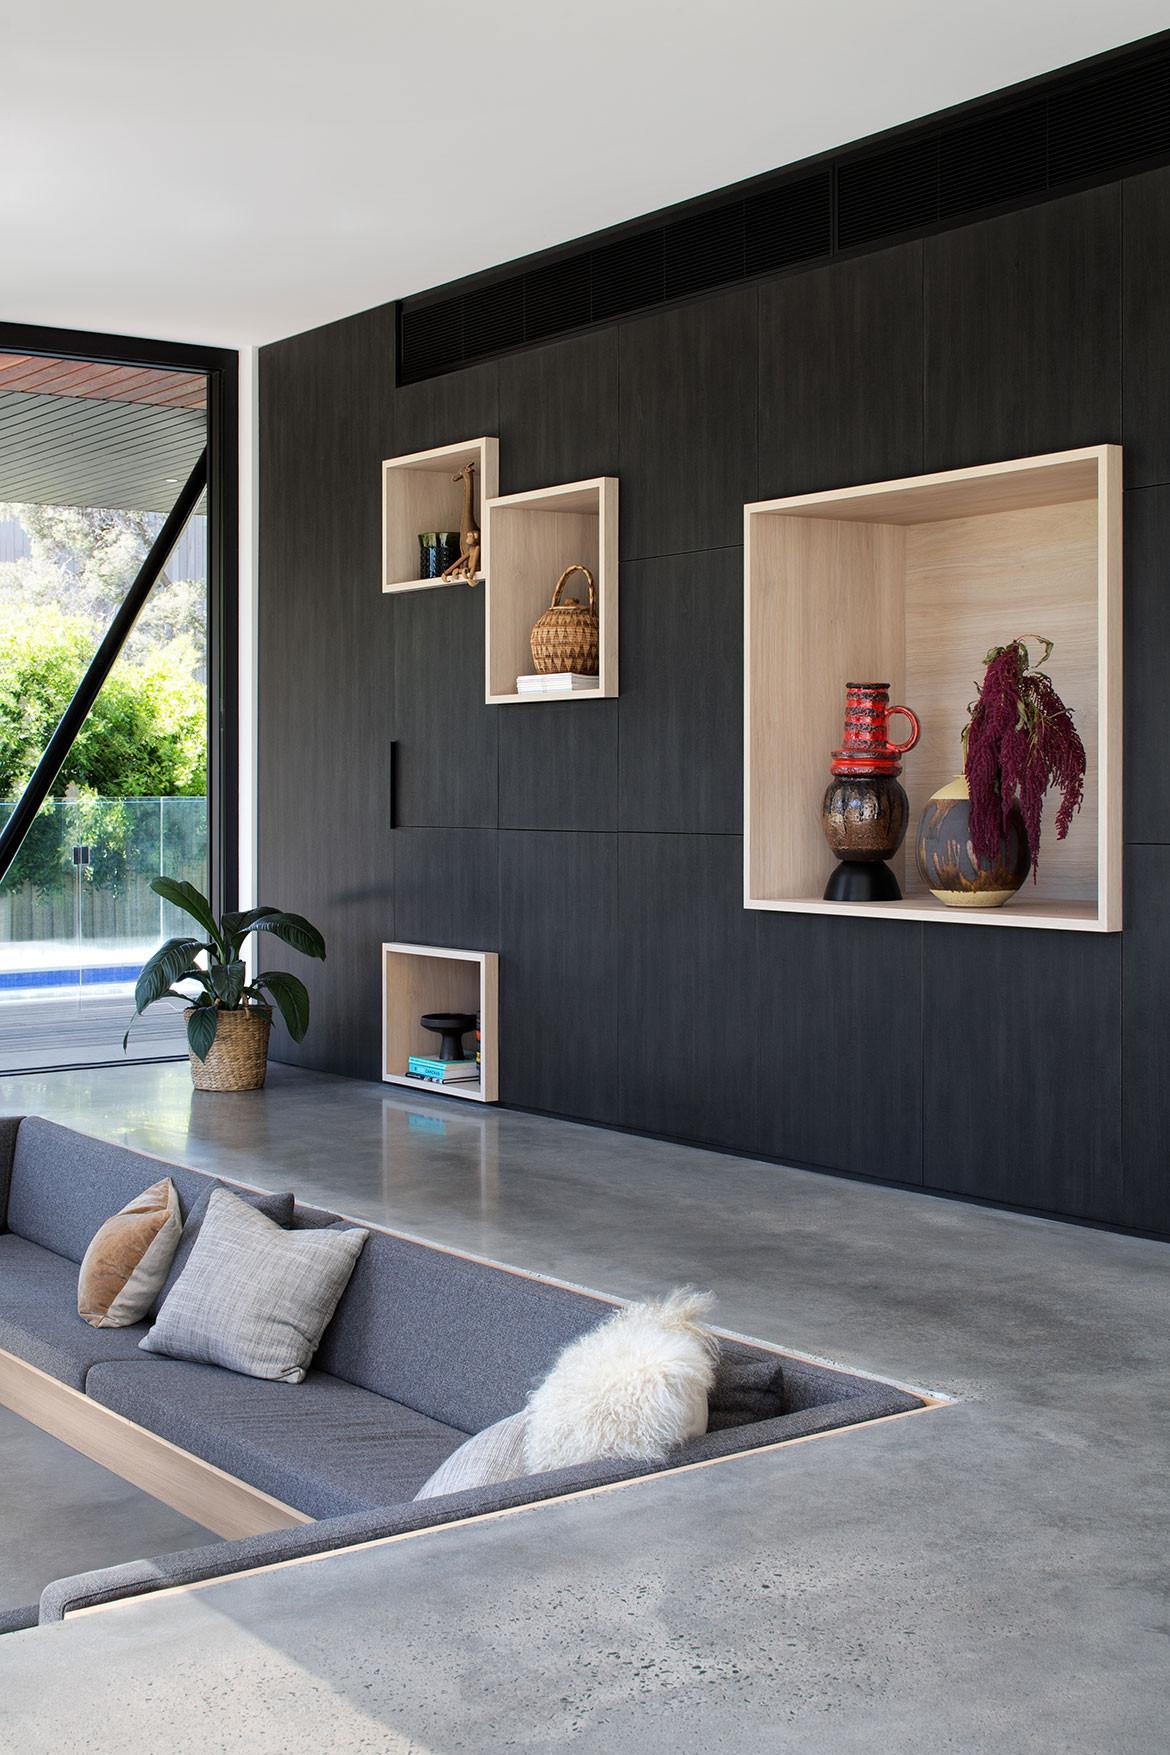 Conversation Piece The Sunken Lounge Habitus Living Sunken living room means